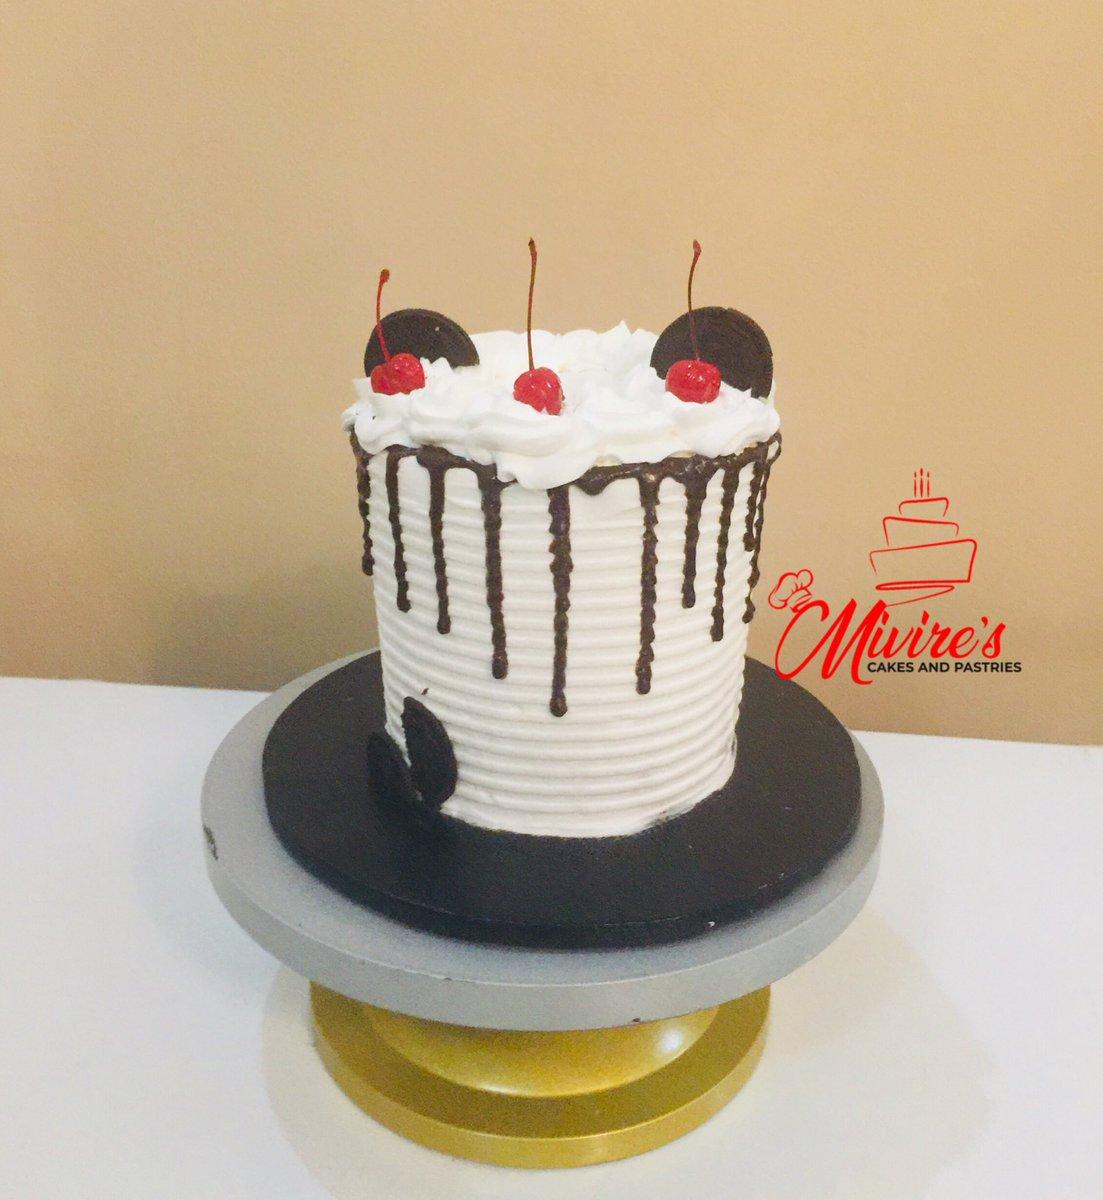 Whipped cream goodness!  #AbujaTwitterCommunity  #whippedcreaminabuja #abujabaker #abujabakers #bakersinabuja #cakesinabuja #abujaconnect #abujamums #abujawedding  #abujaweddings #abujafoodie #abujacakes #abujaslayers #abujavendor #abujavendors #abujalifestyle #abujapic.twitter.com/uO46bPFPPt